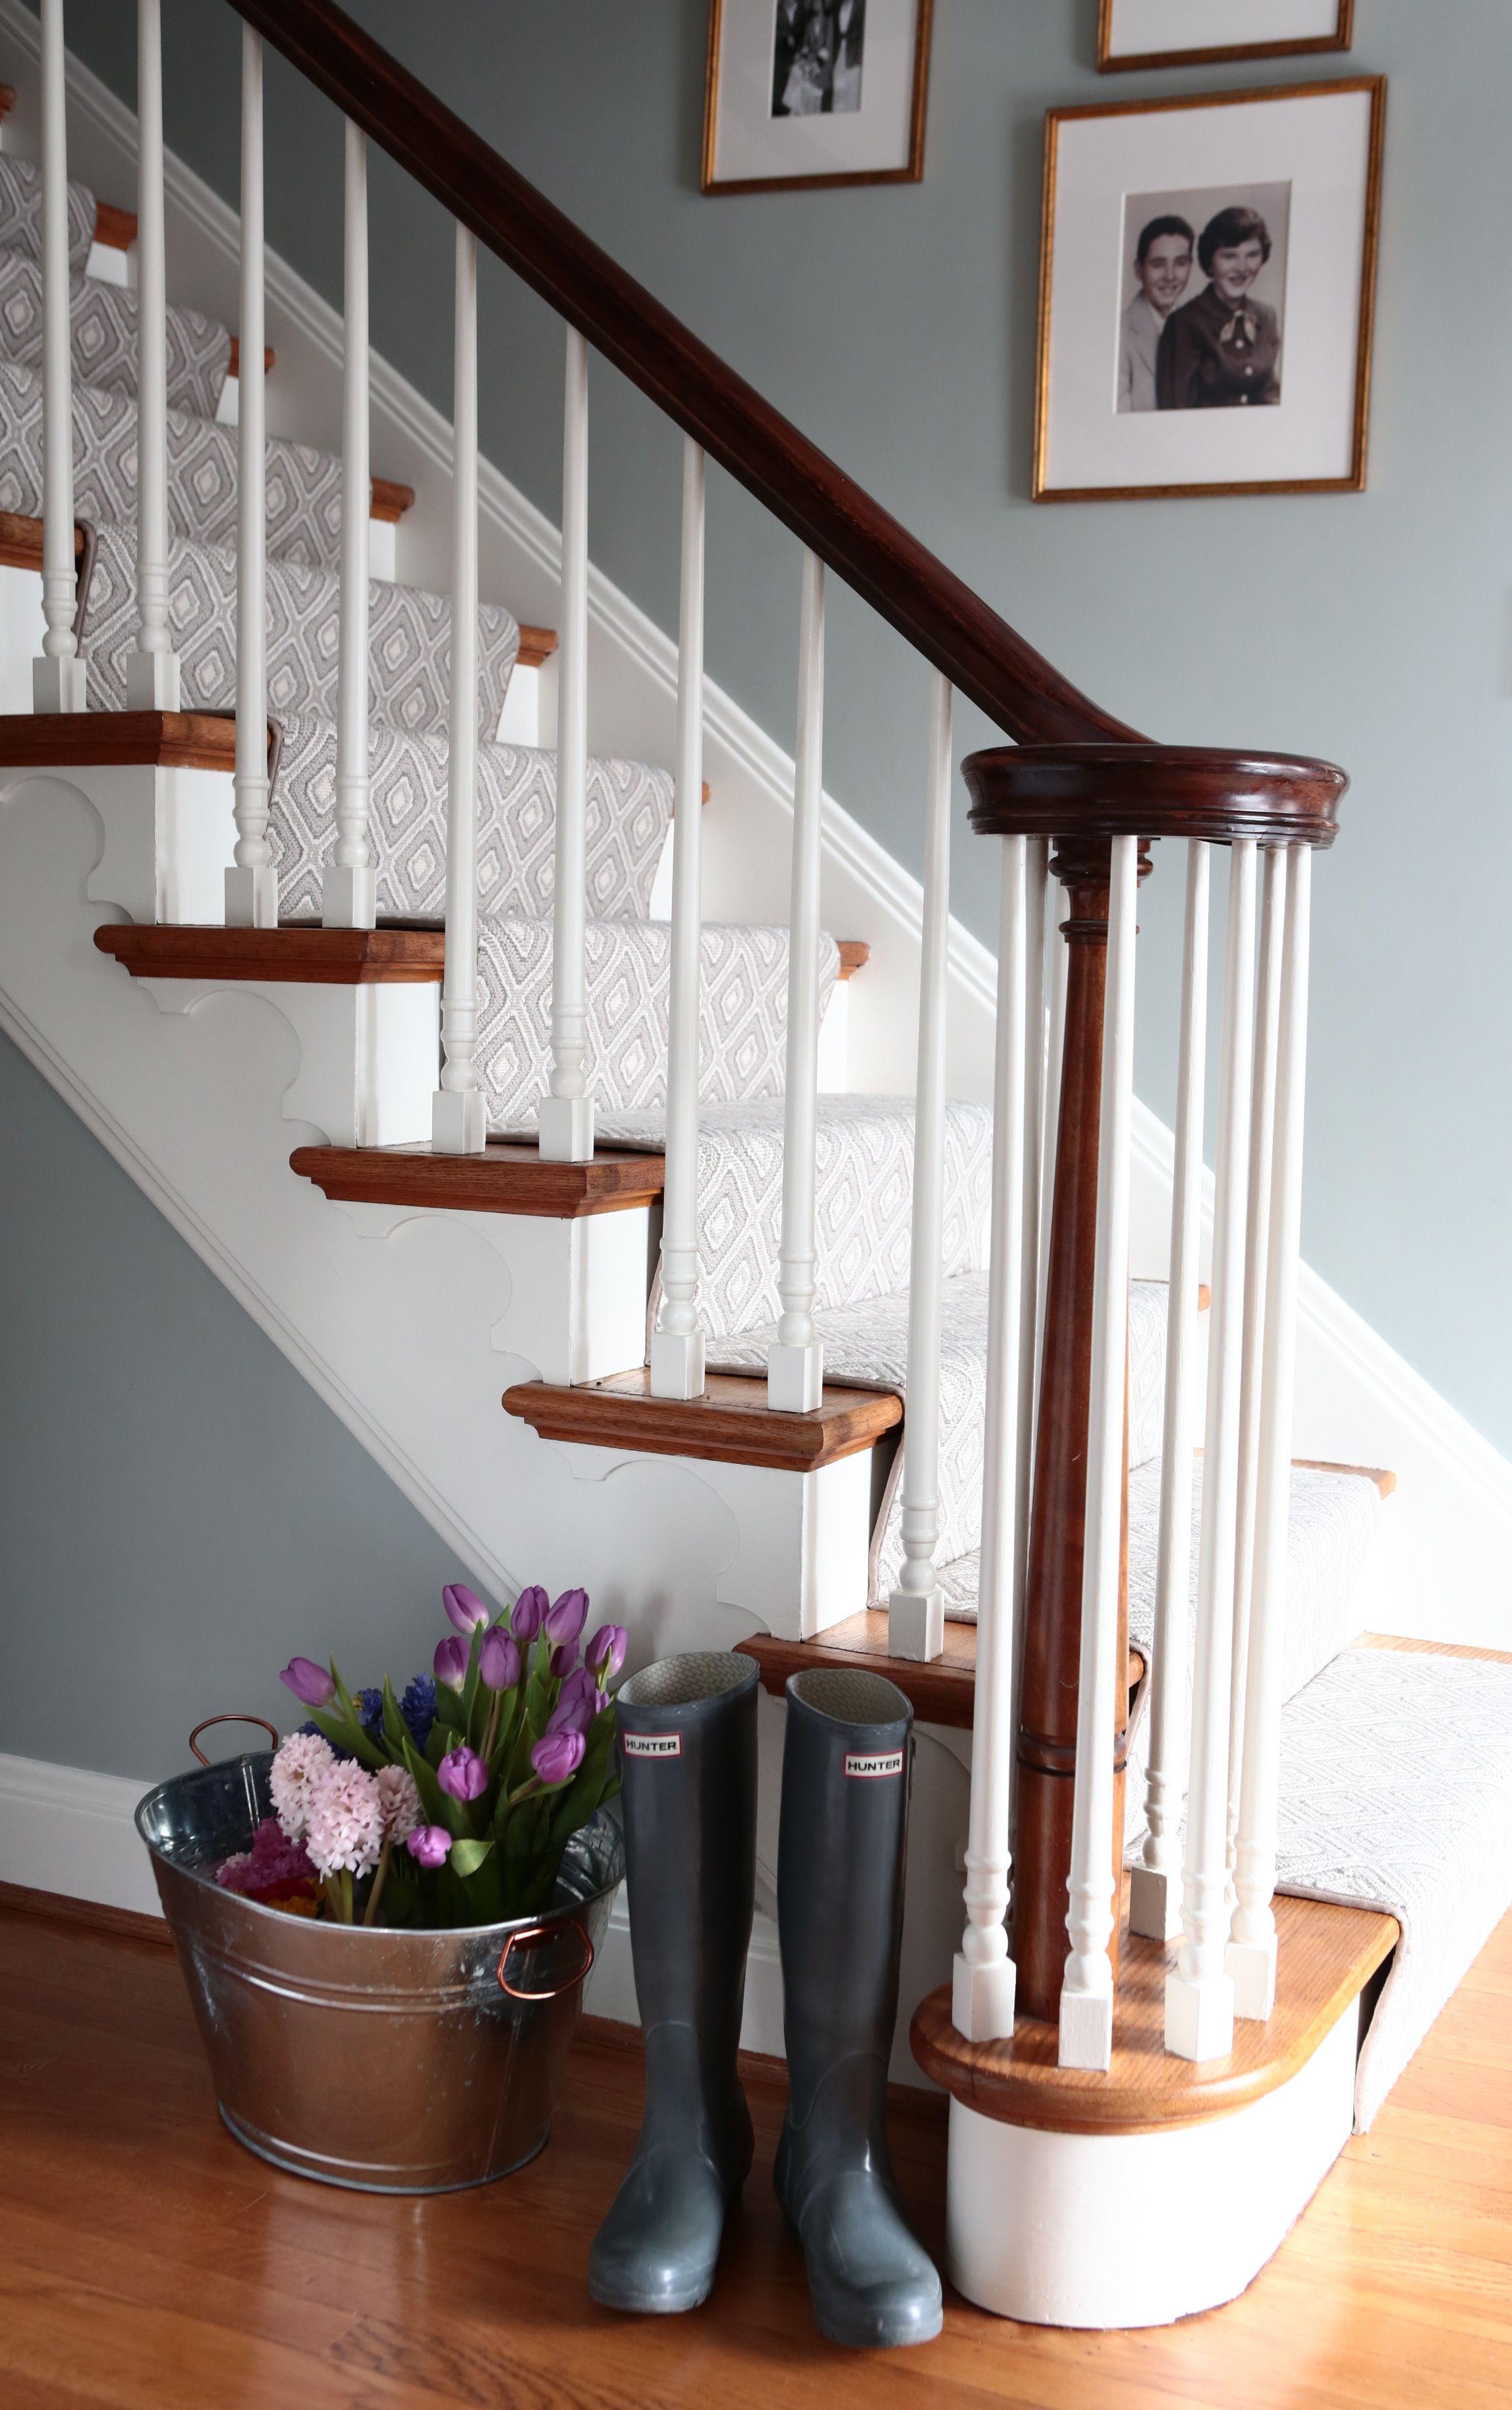 Hallway stair carpet ideas  stark carpet stair runner  alisha gwen interior design  Ideas for